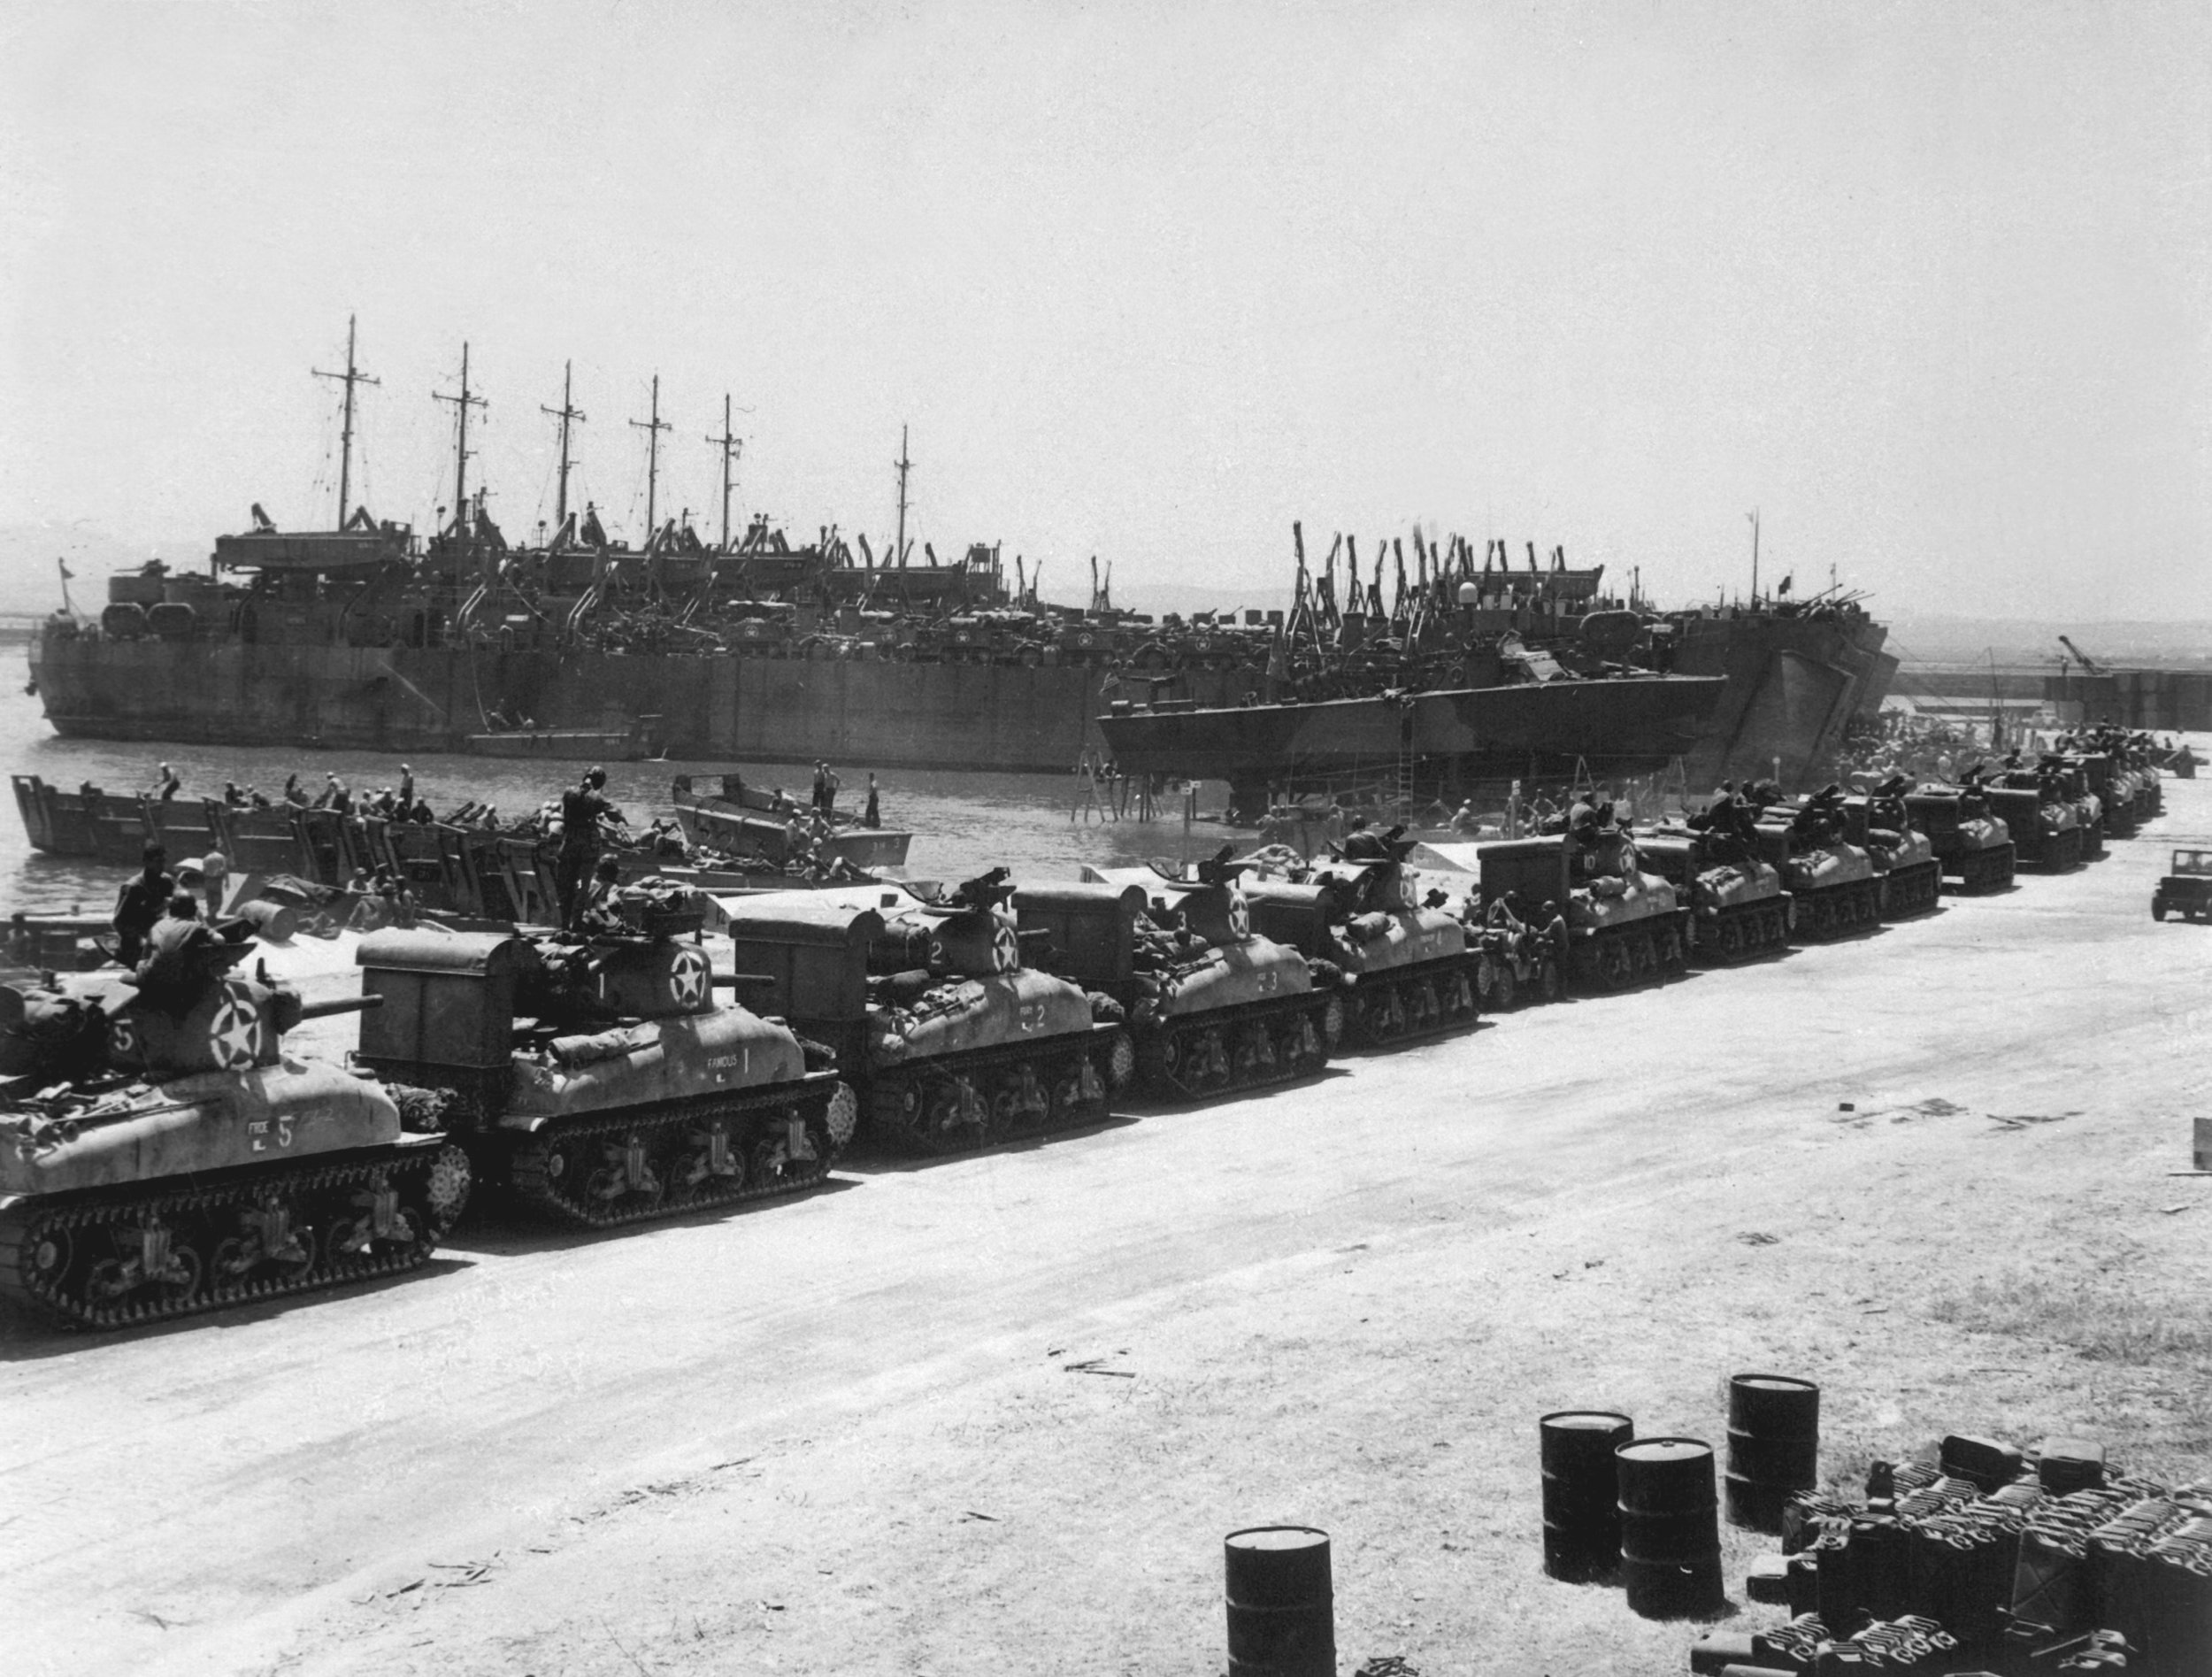 M4 Sherman tanks being loaded onto LSTs for Operation Husky, Pêcherie, Bizerte, Tunisia.